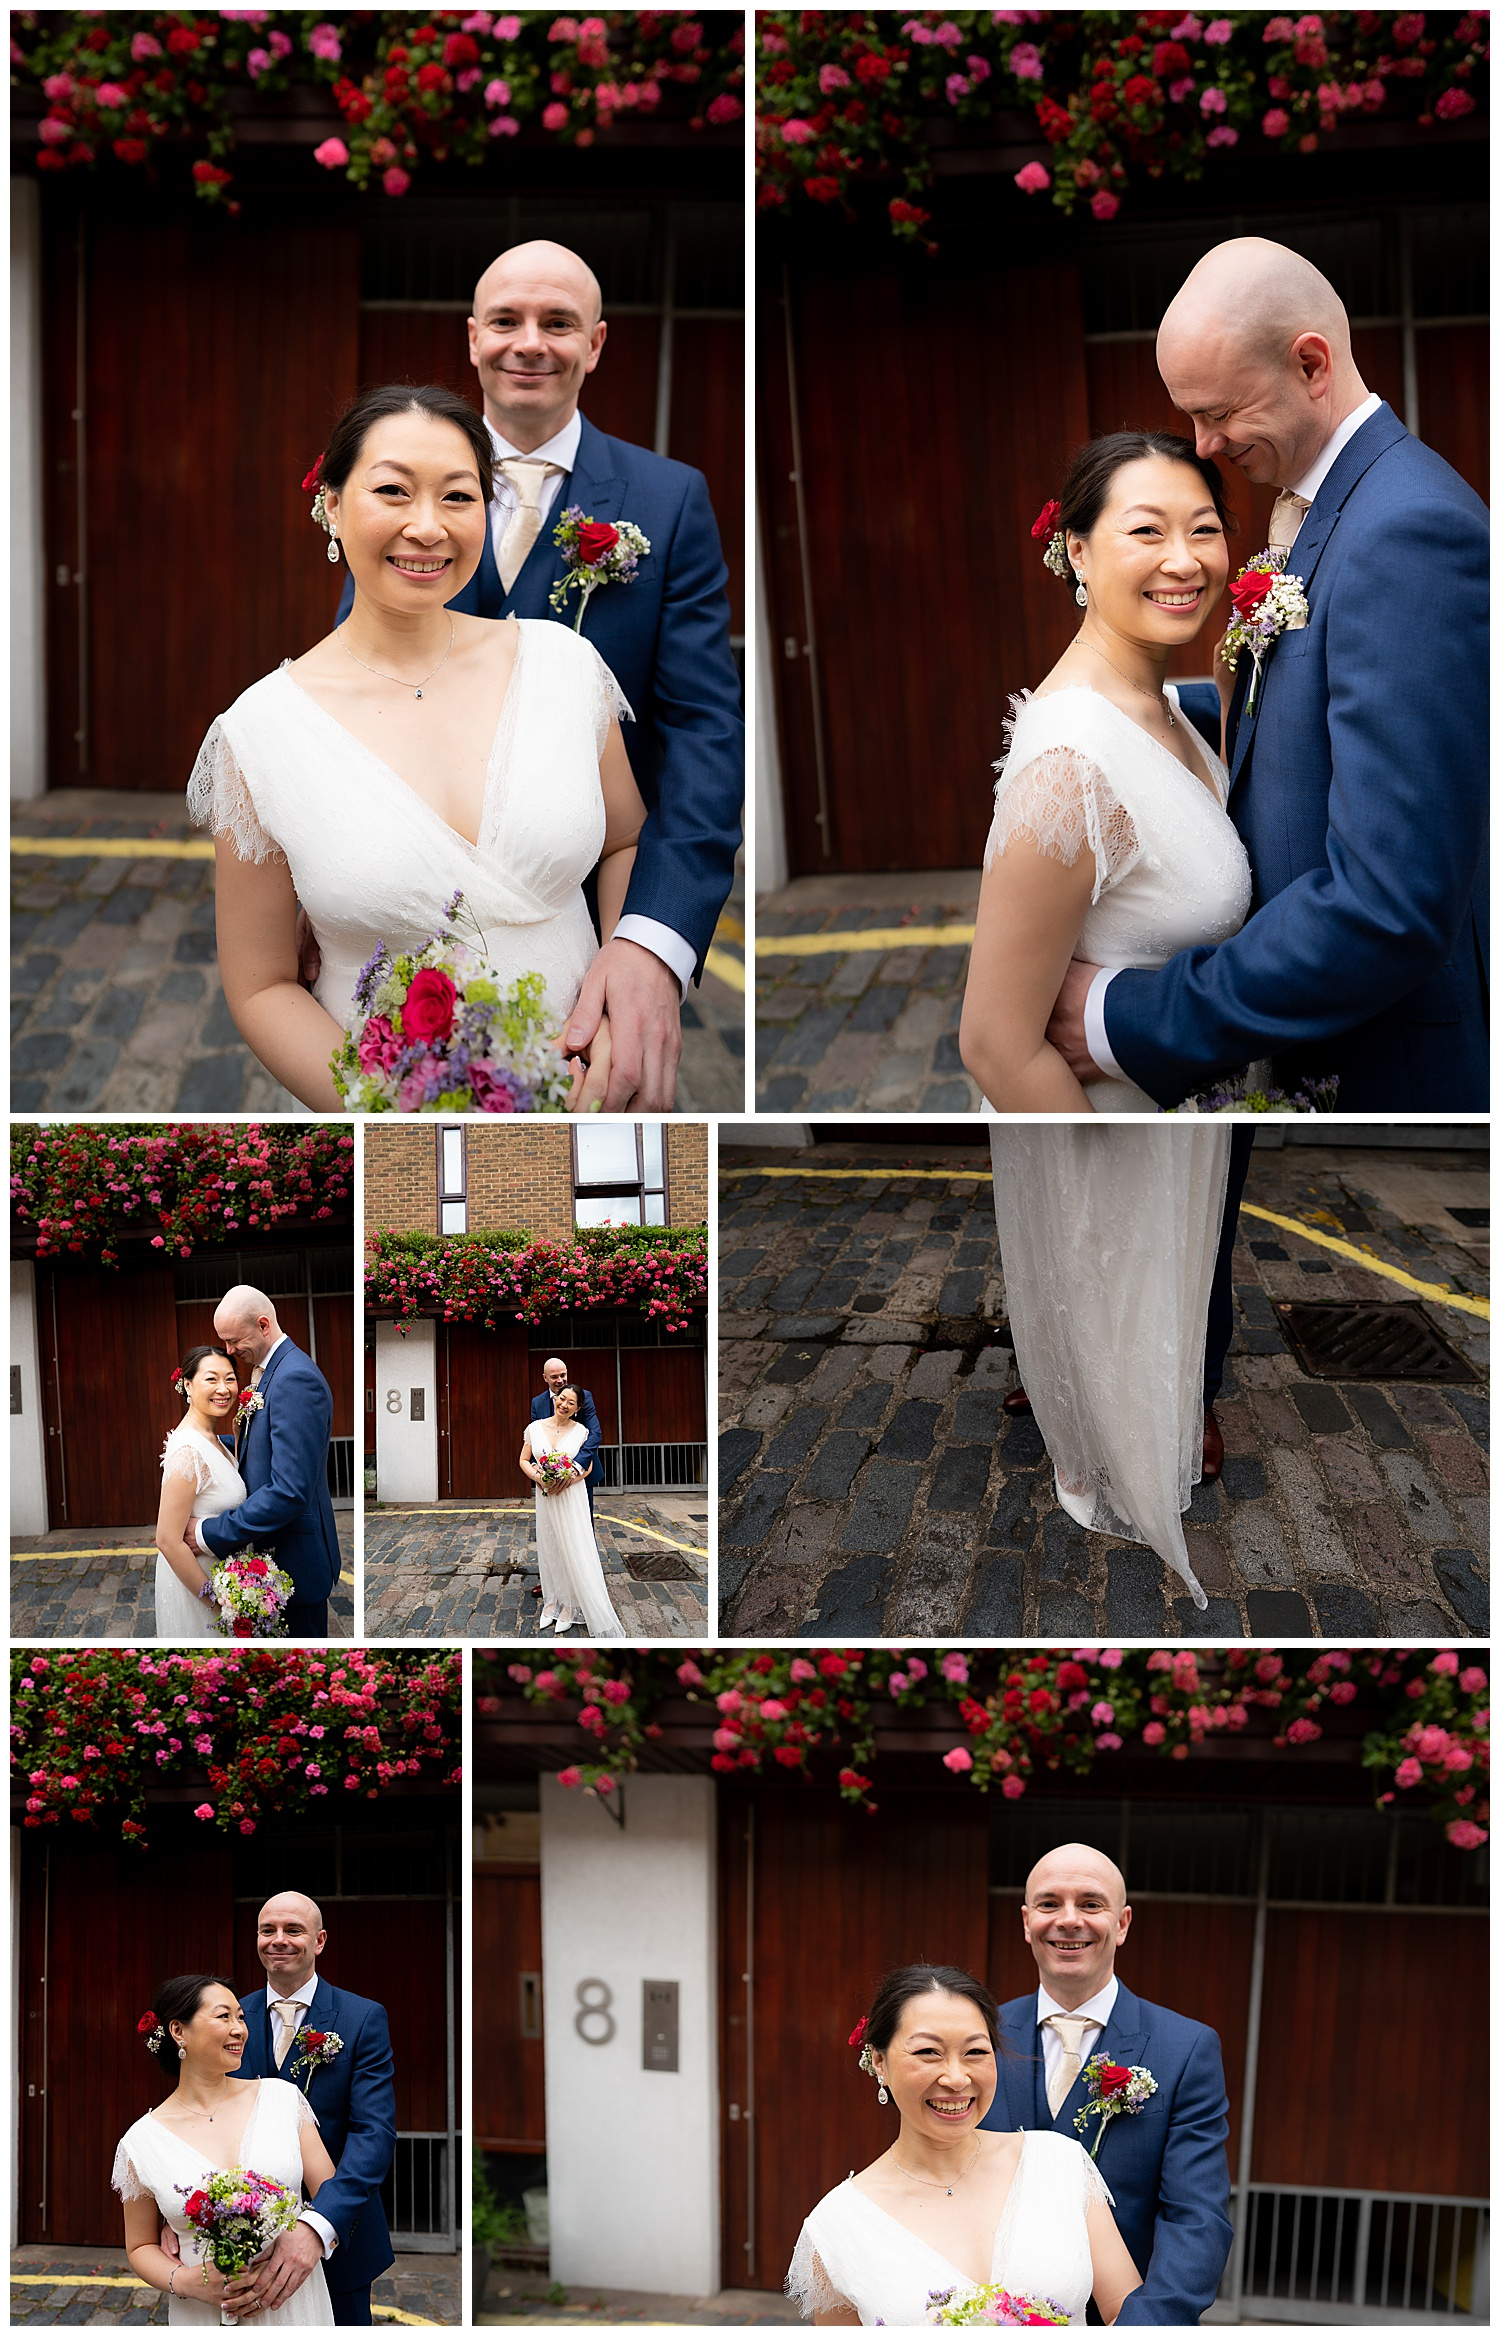 marylebone-town-hall-wedding-11.jpg